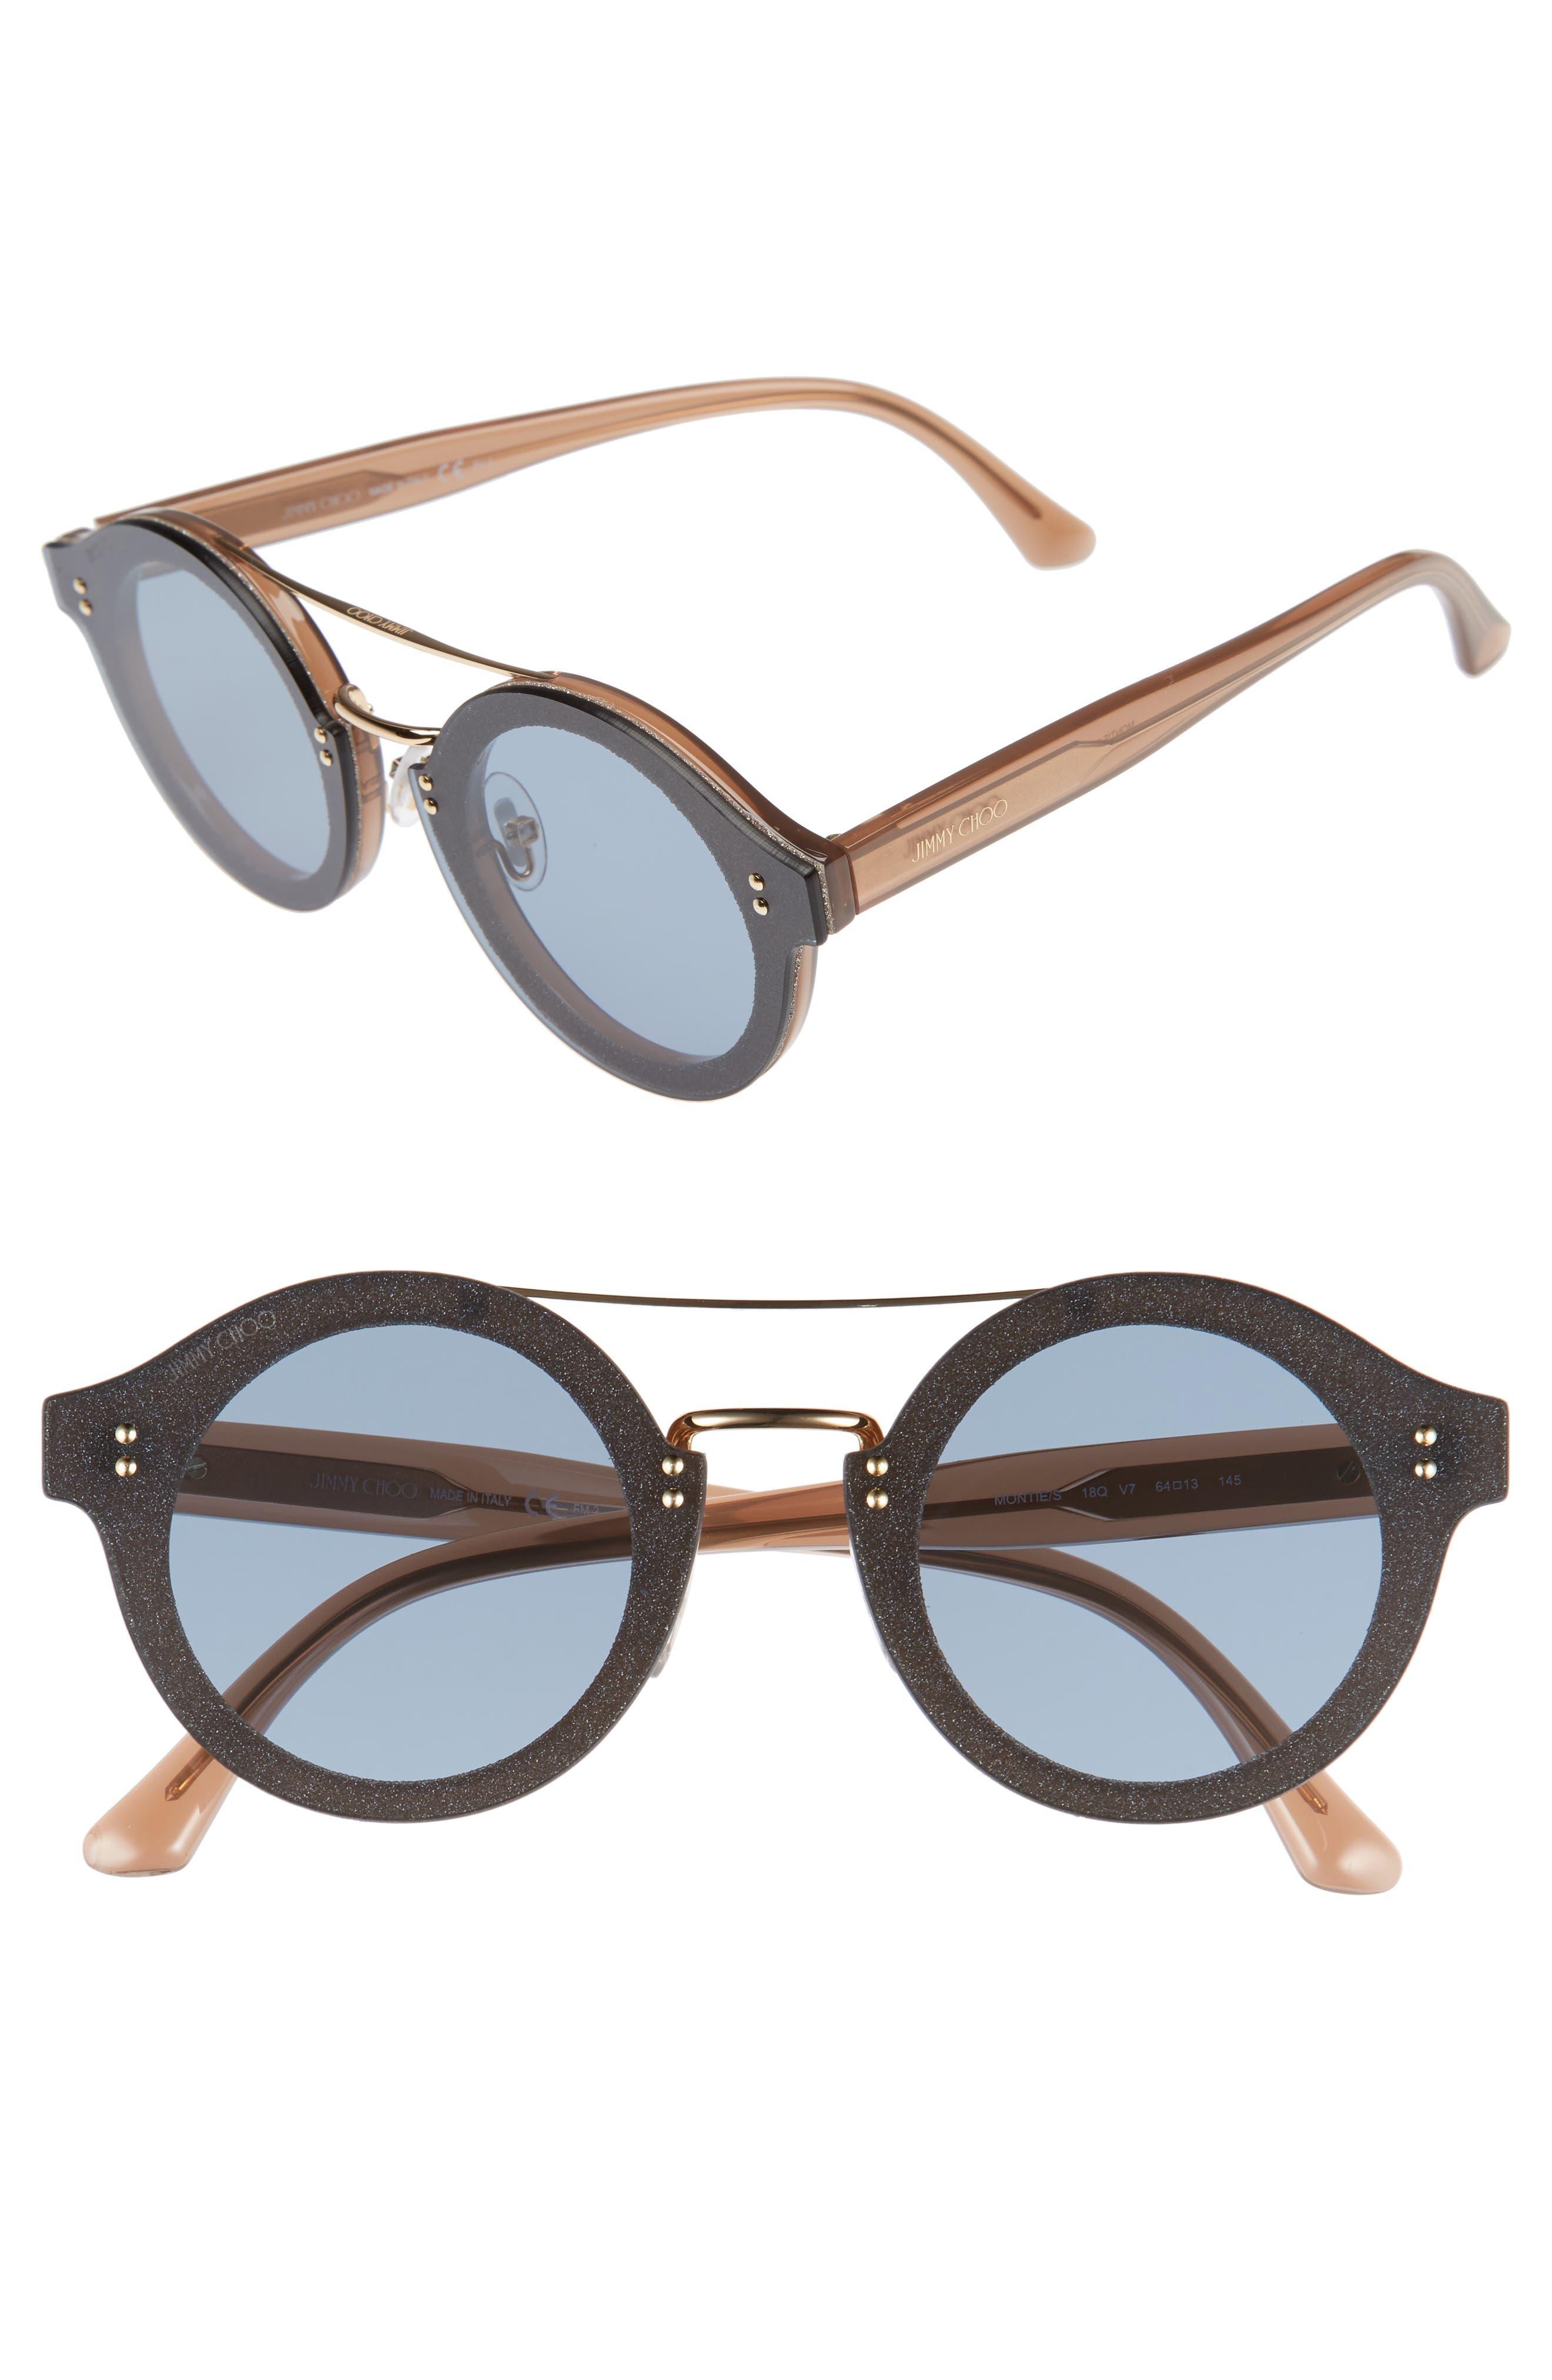 Alternate Image 1 Selected - Jimmy Choo Monties 64mm Round Sunglasses